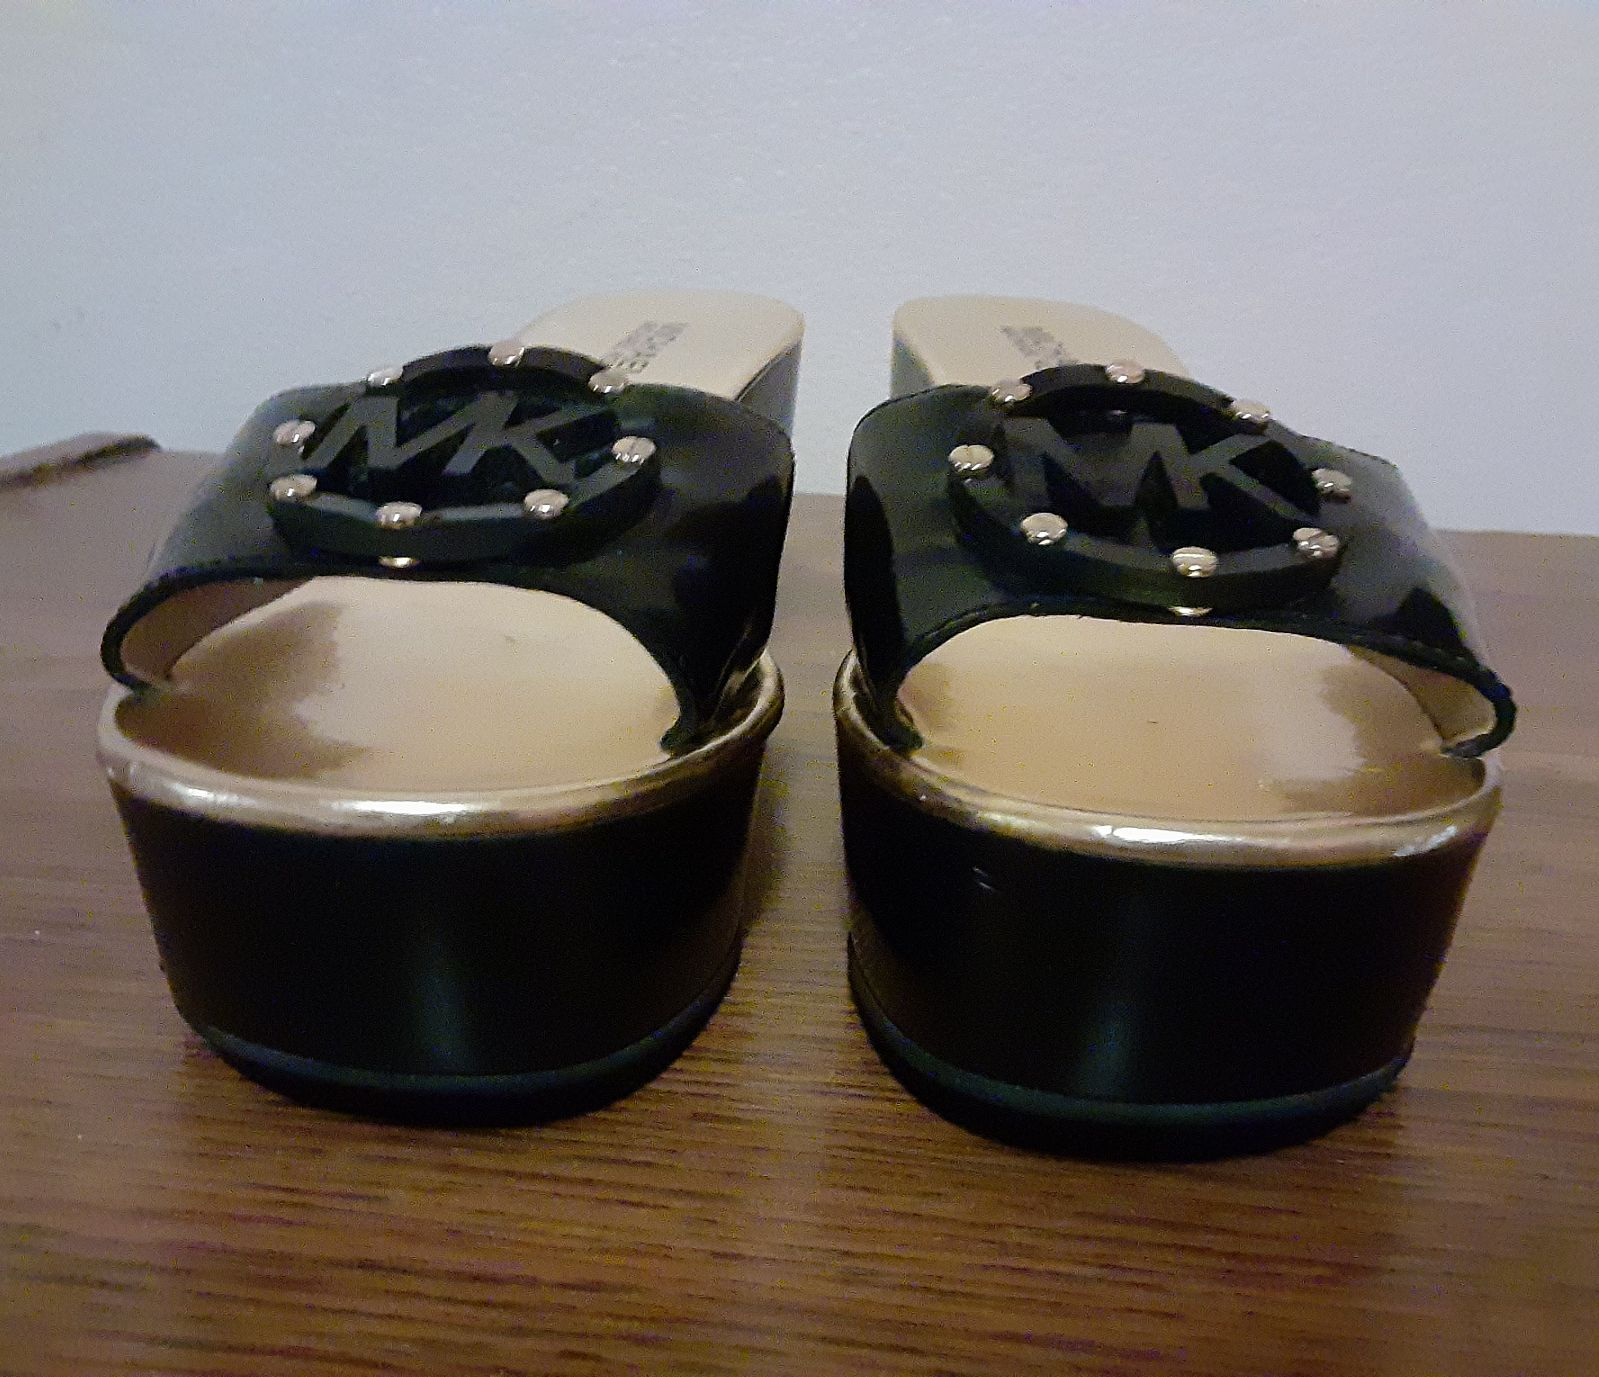 Michael Kors wedge heels shoes